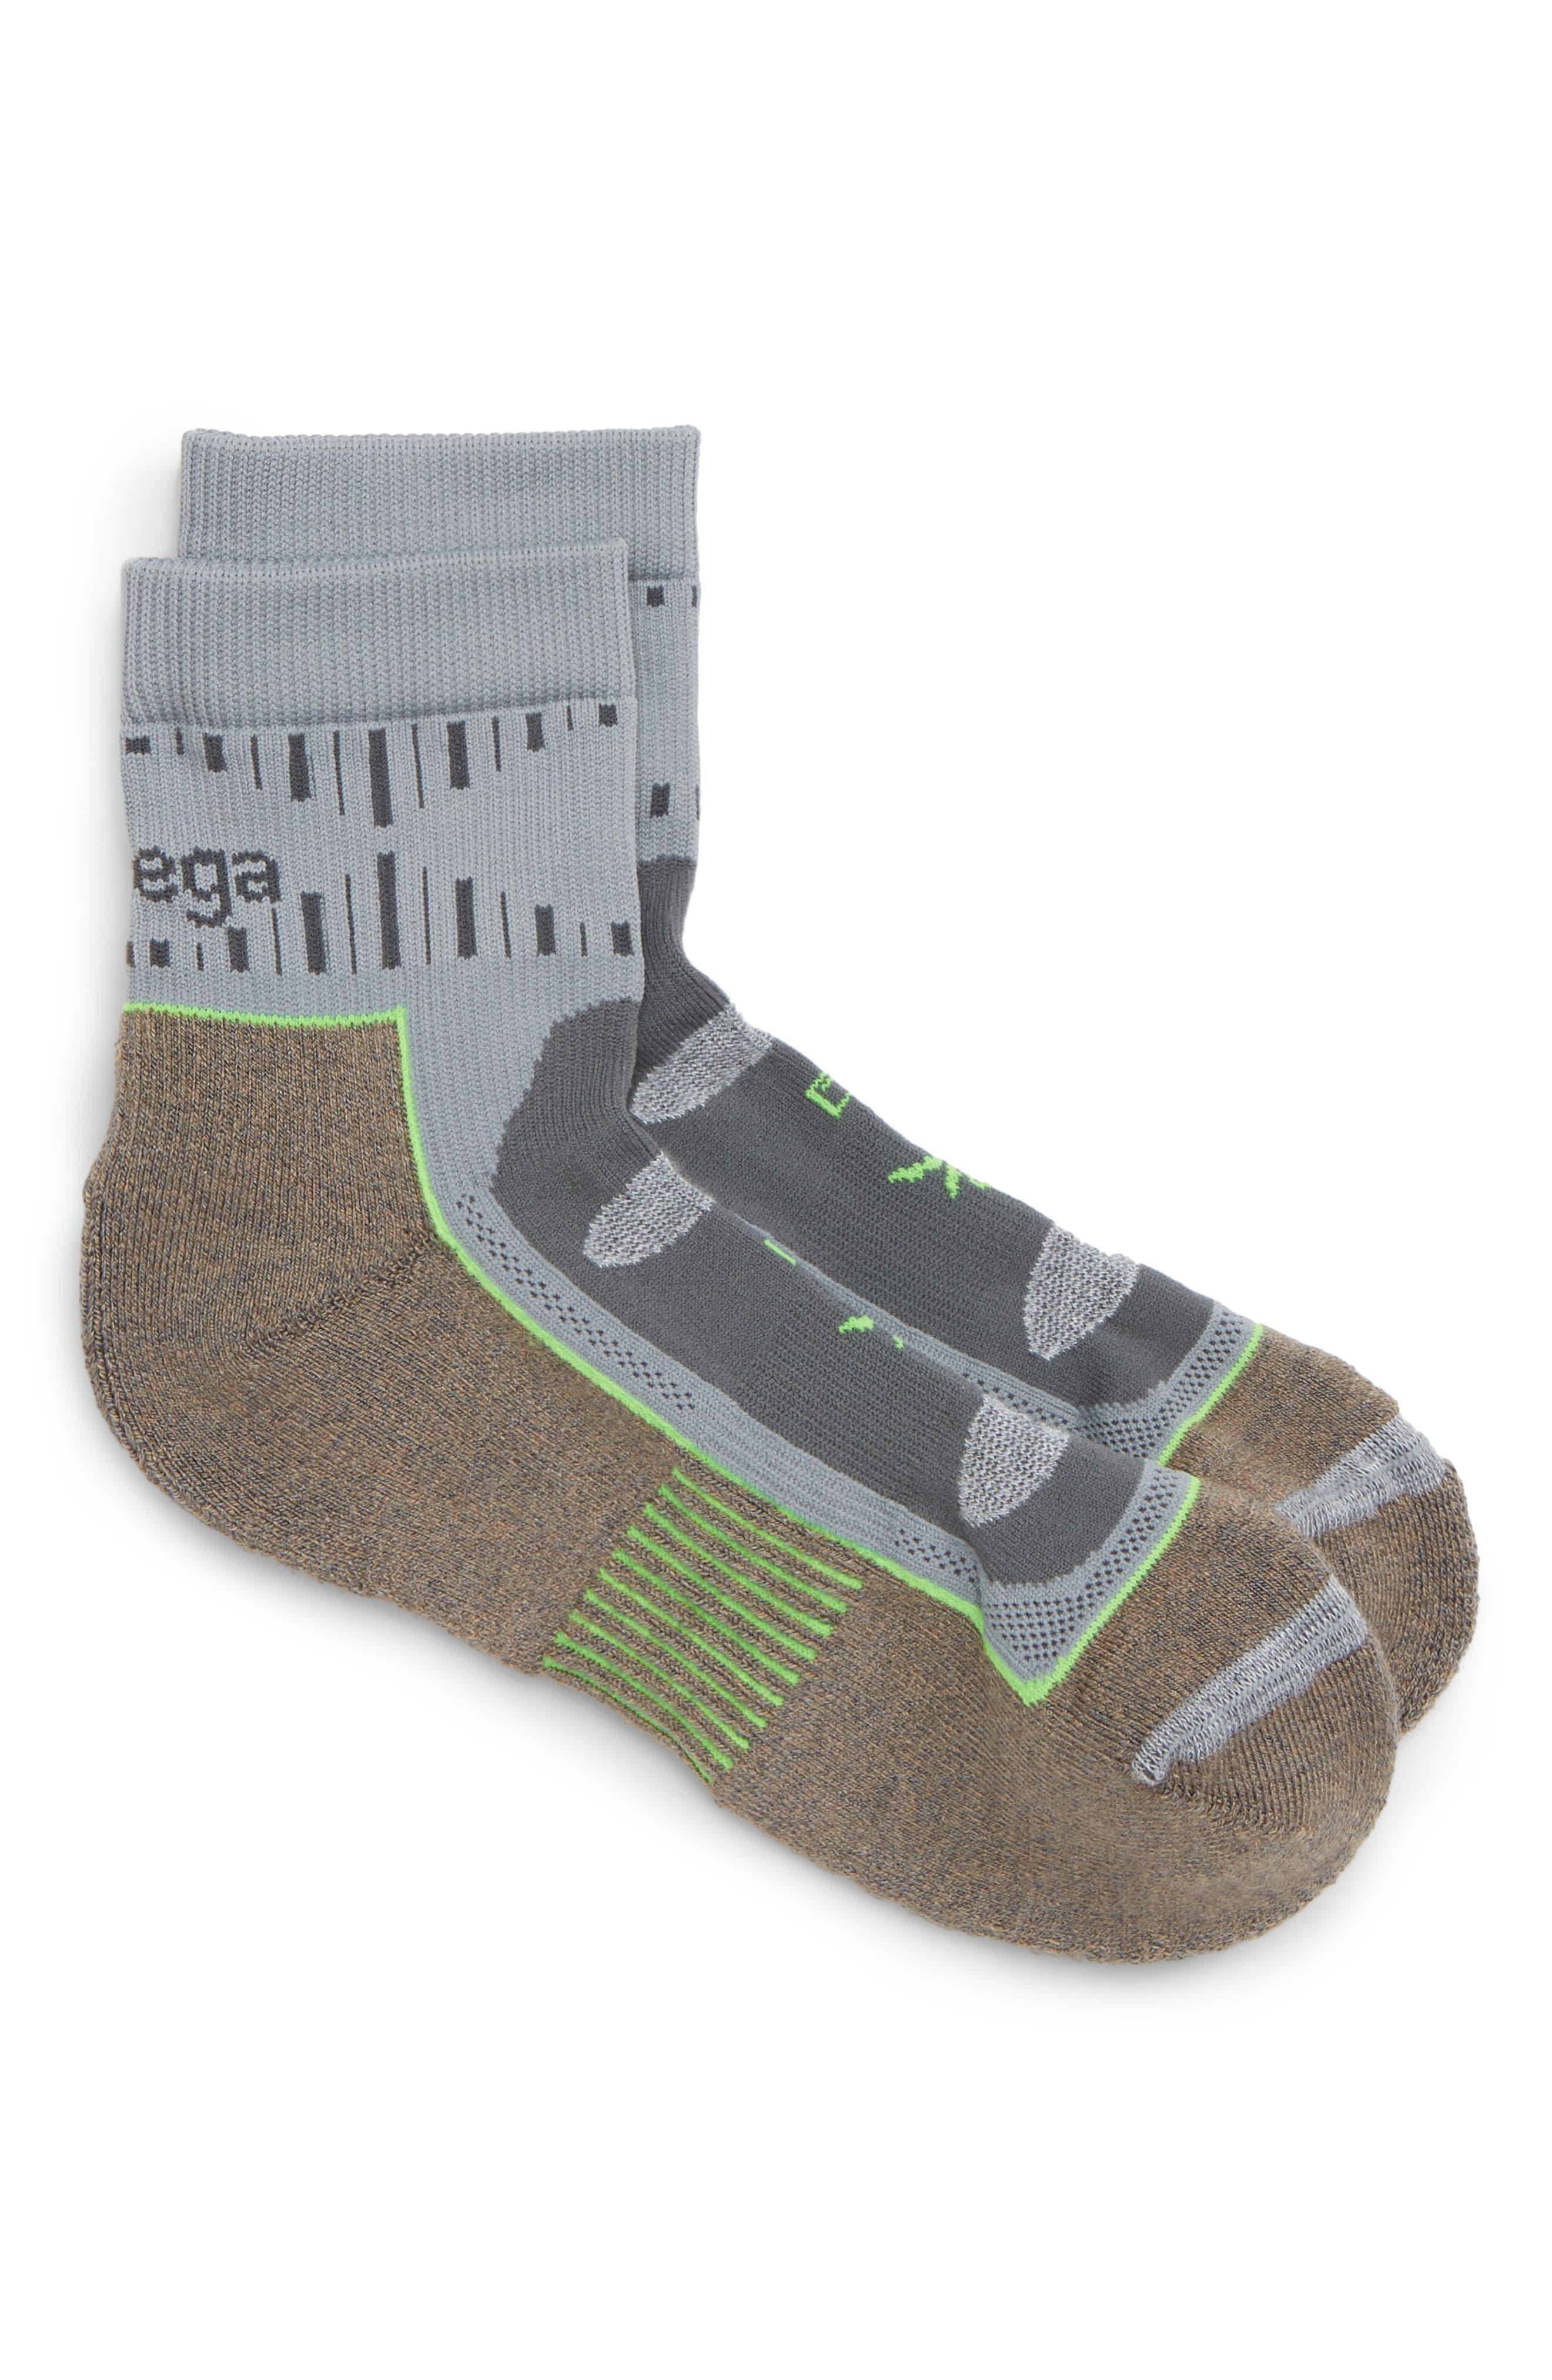 Nord Blast Quarter Socks,                             Main thumbnail 1, color,                             MINK/ GREY